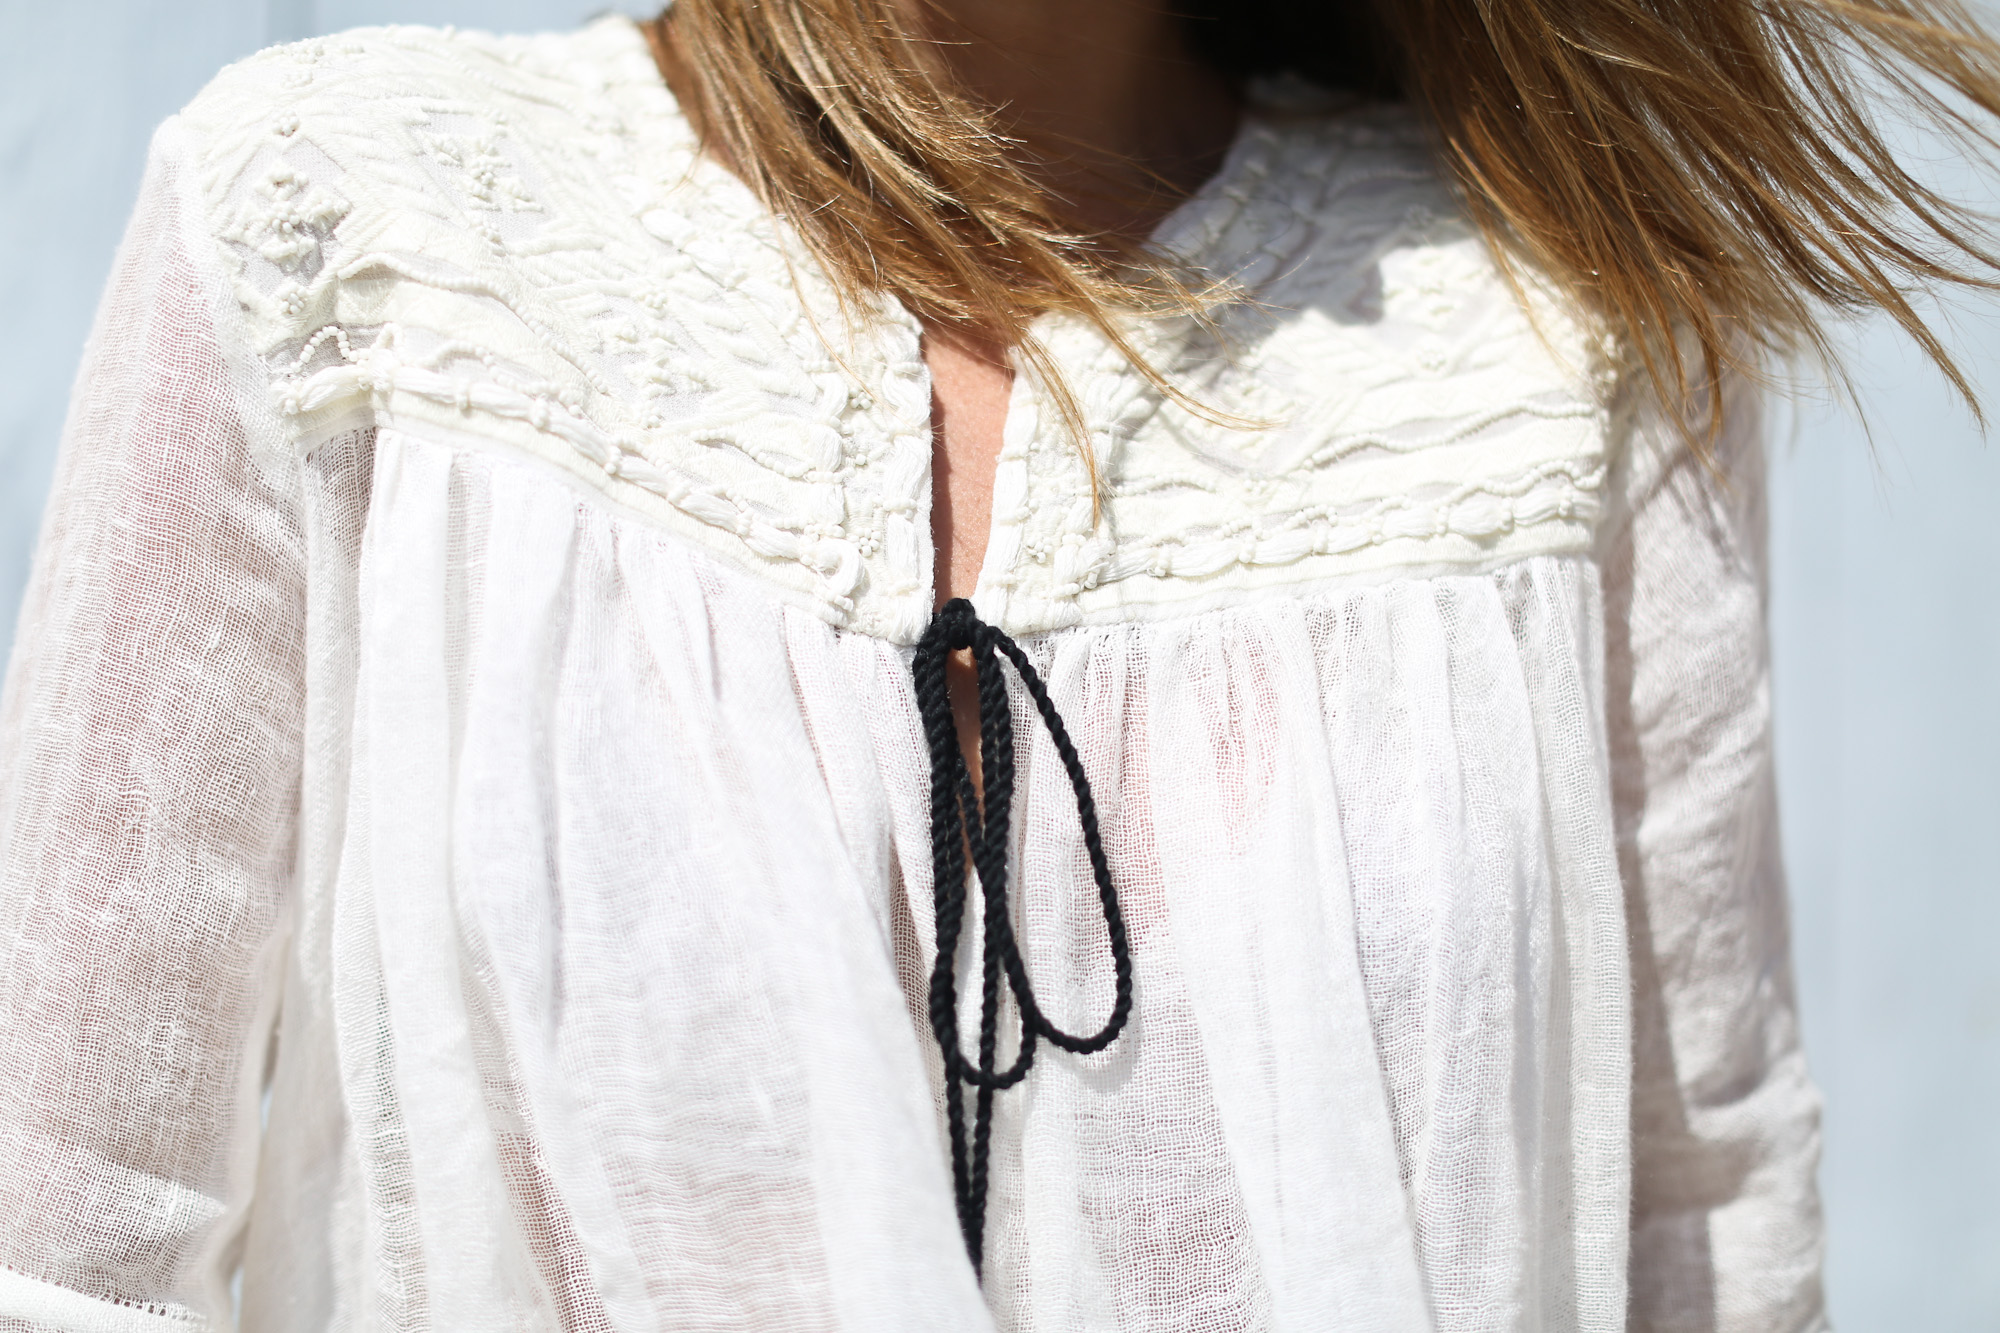 Clochet_streetstyle_zara_embroided_linen_kimonojacket_vintagelevis501shorts-5